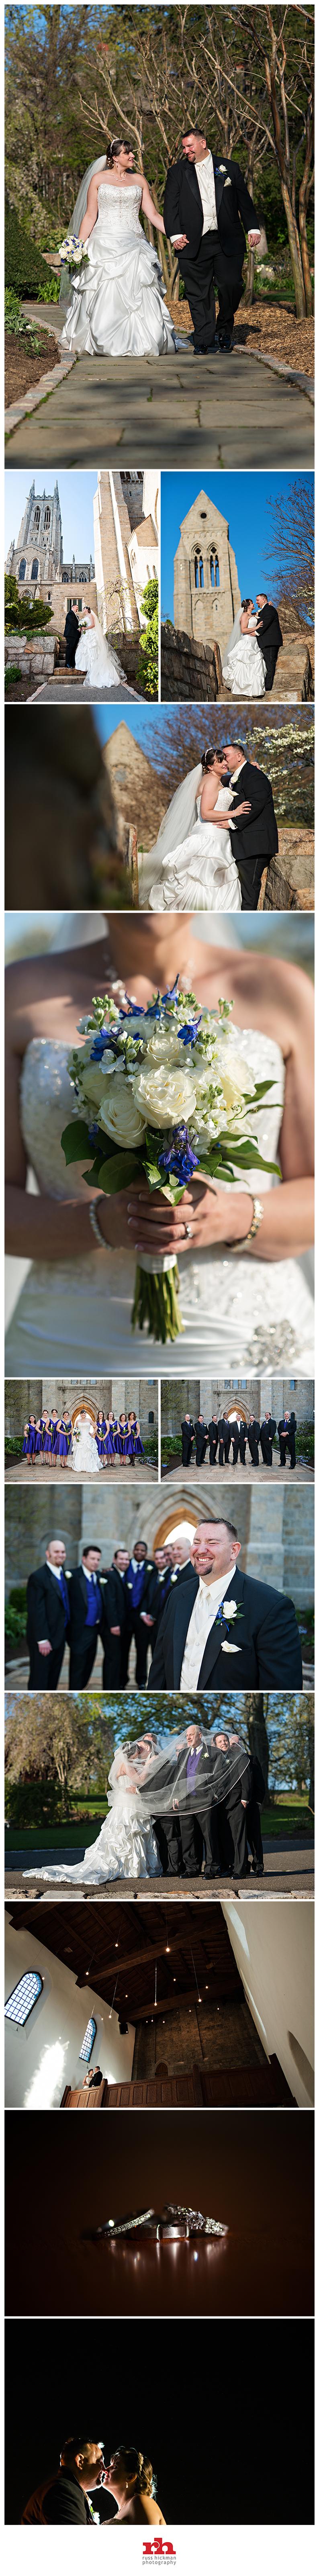 Philadelphia Wedding Photographer RTWB0005